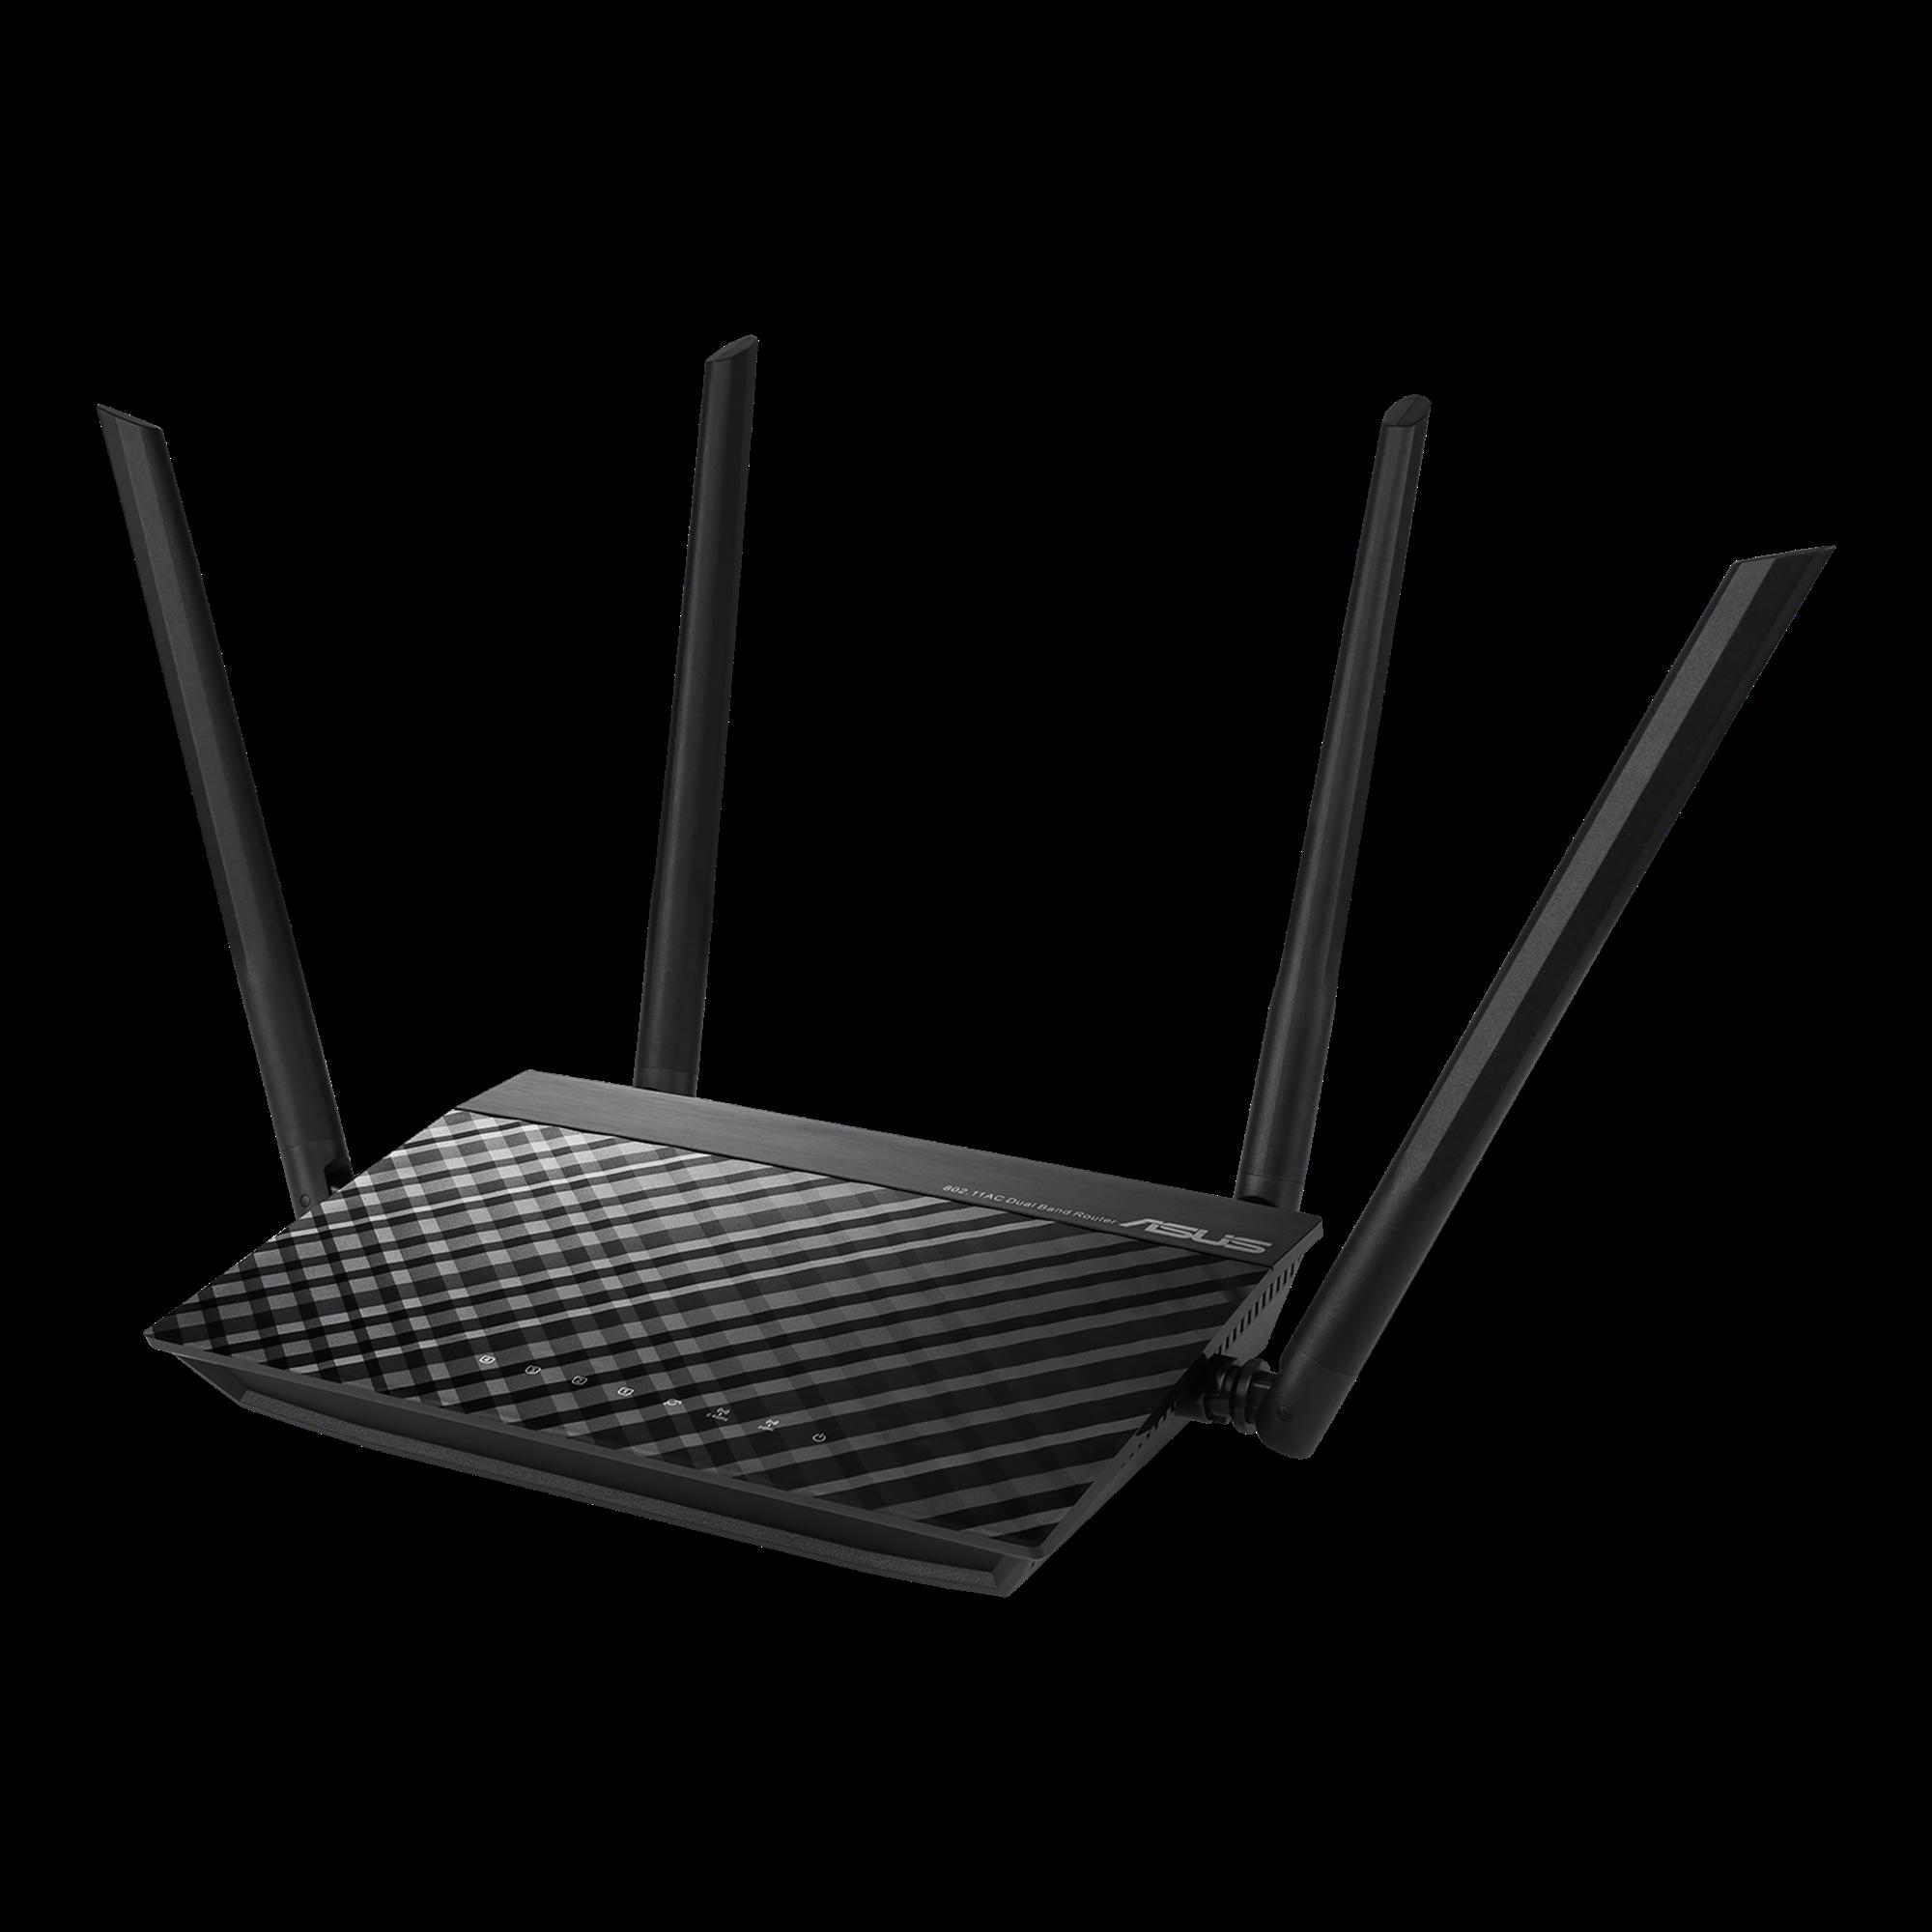 Router Asus Ac1200 V2 4 Antenas 2Xbanda